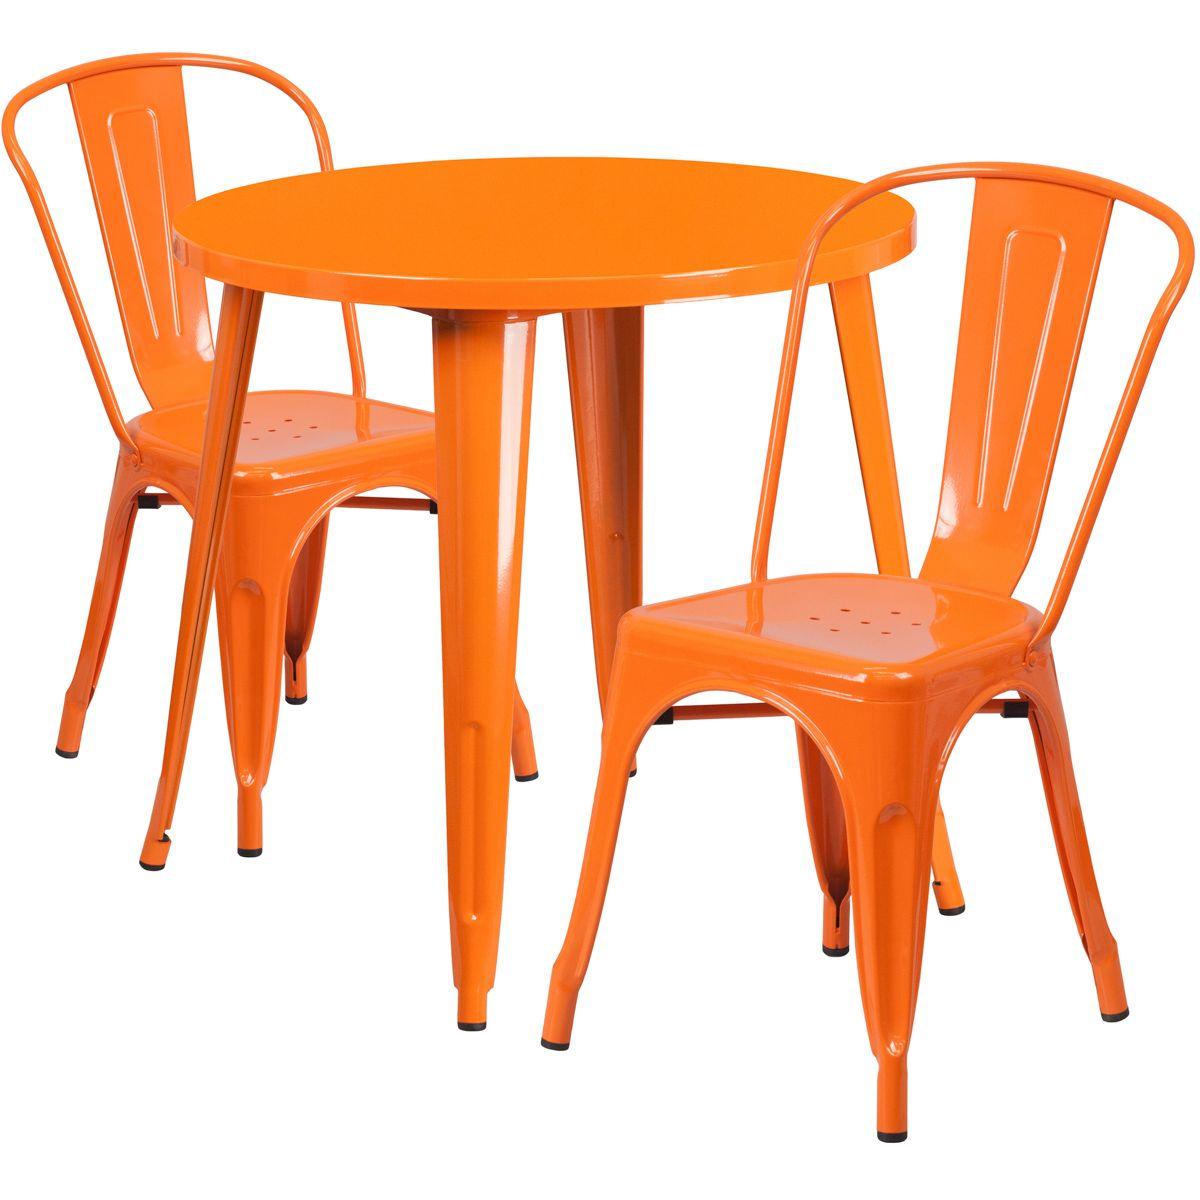 "30"" Round Metal Dining Table Set - Stack Chairs - Orange"